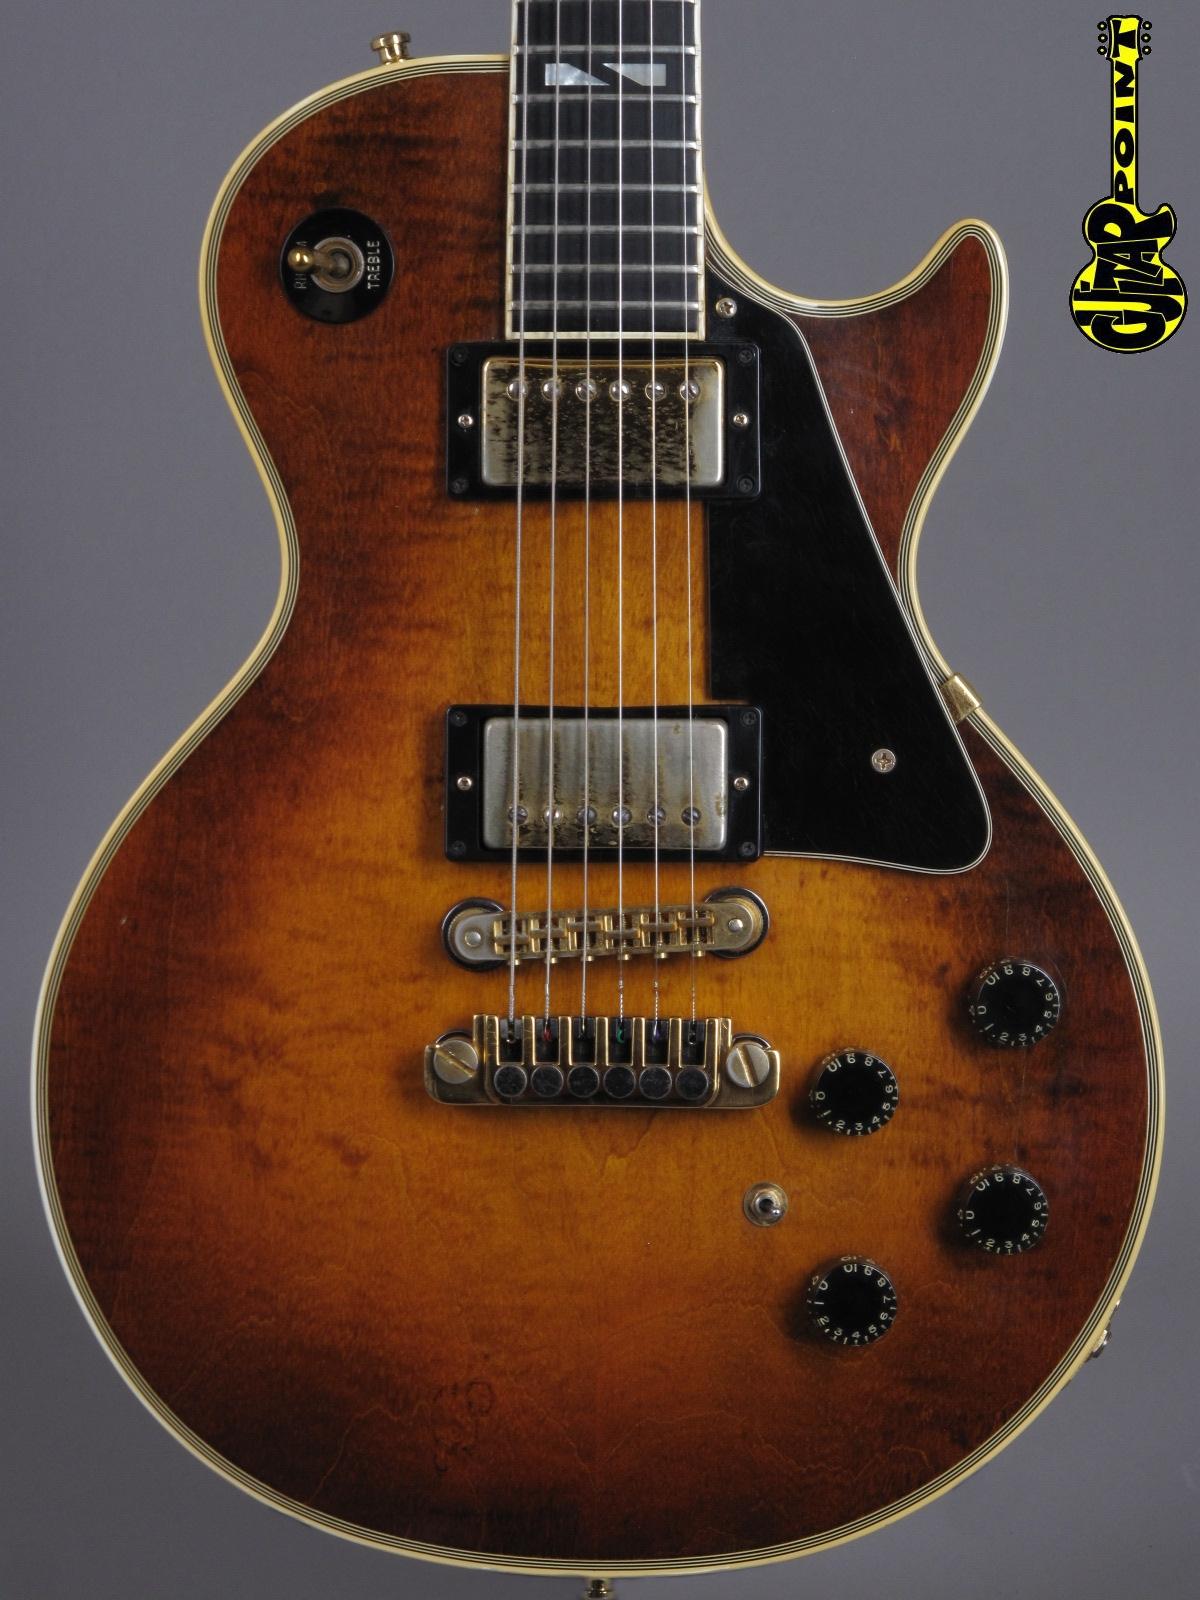 1978 Gibson Les Paul 25/50 Anniversary - Sunburst